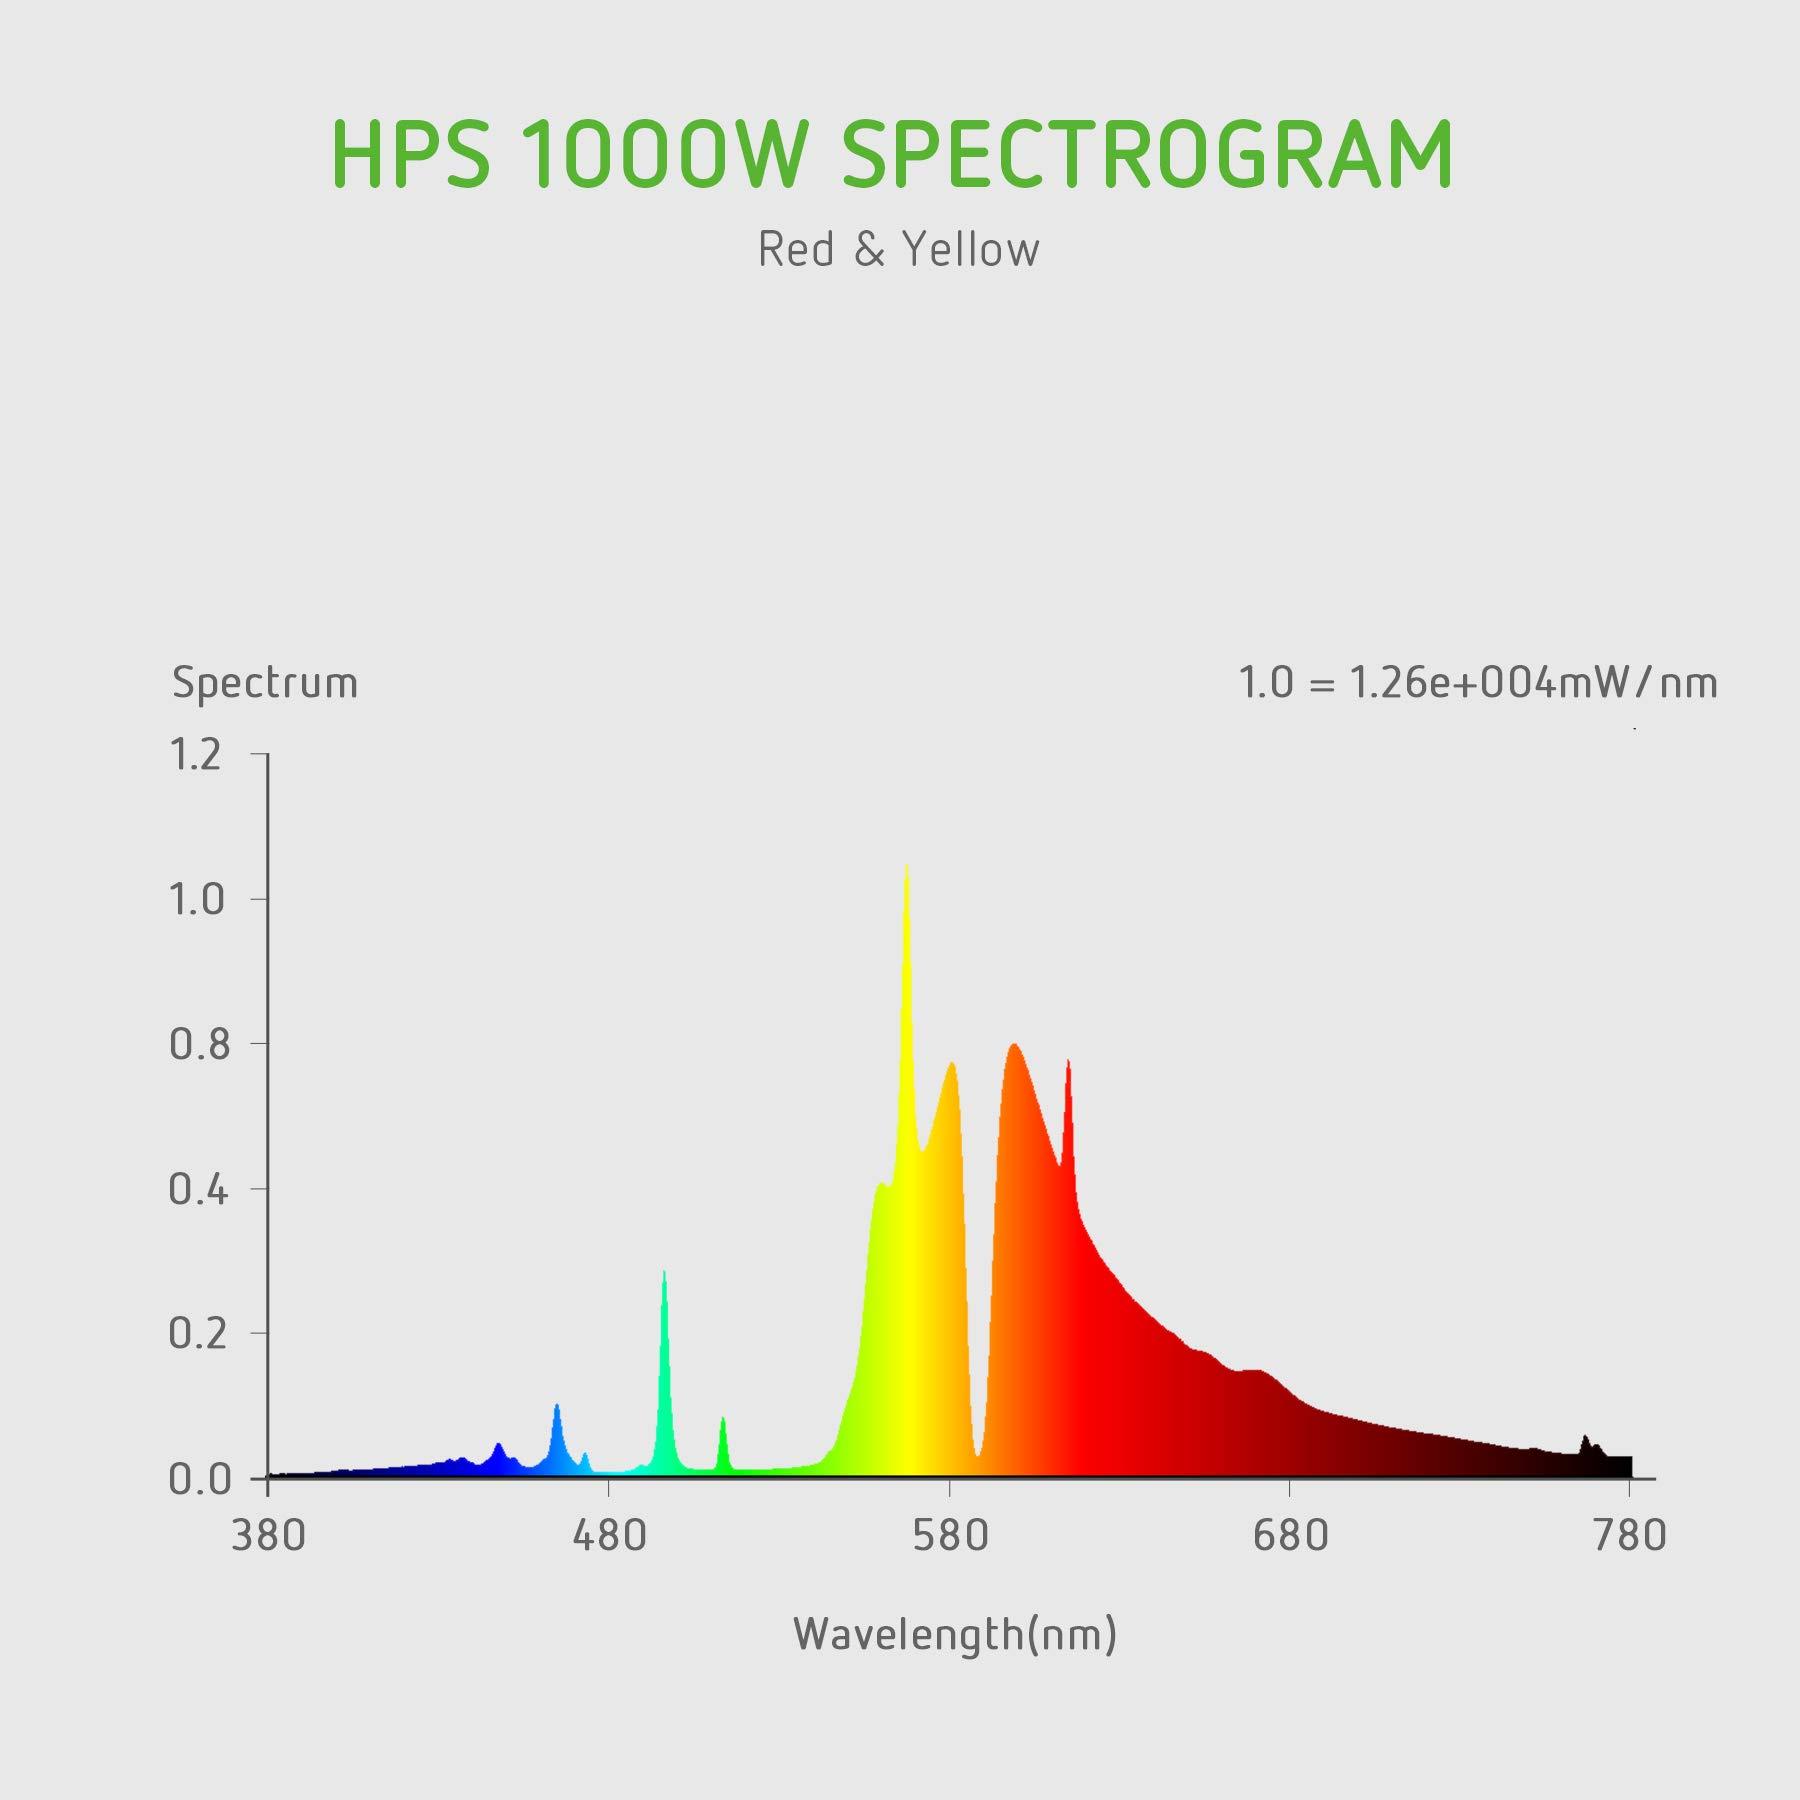 VIVOSUN 2 Pack of 1000W Double Ended High Pressure Sodium DE HPS Grow Bulb - Super Lumens 151,000 for Flourishing Growth [CCT 2100K] by VIVOSUN (Image #3)